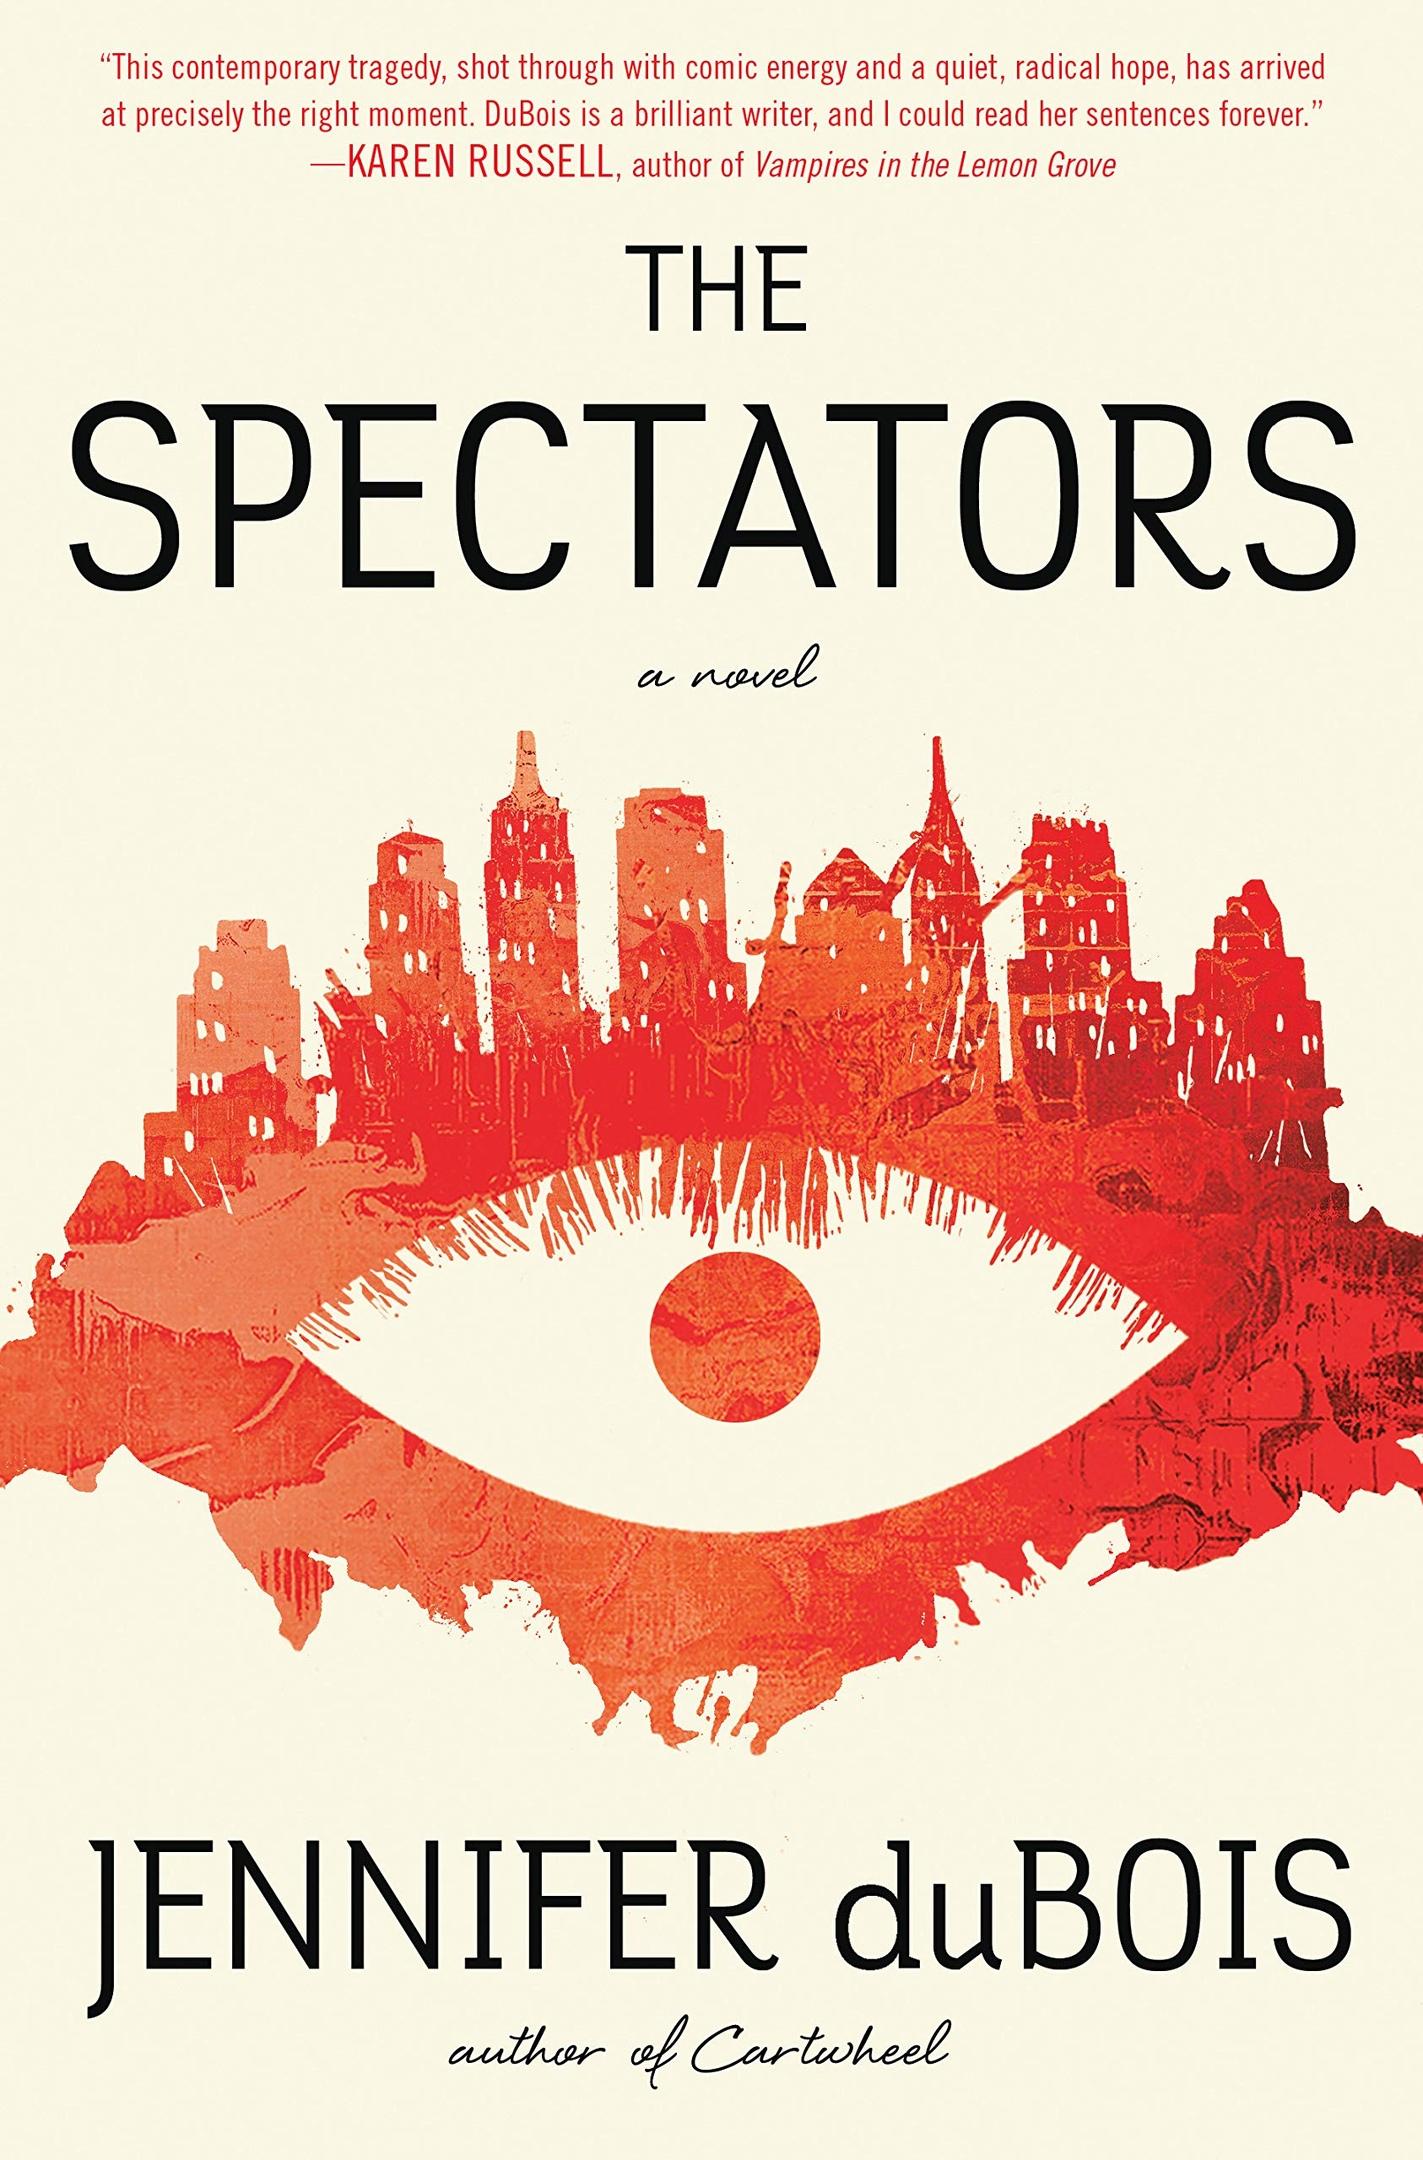 Jennifer DuBois – The Spectators Genre: Author: